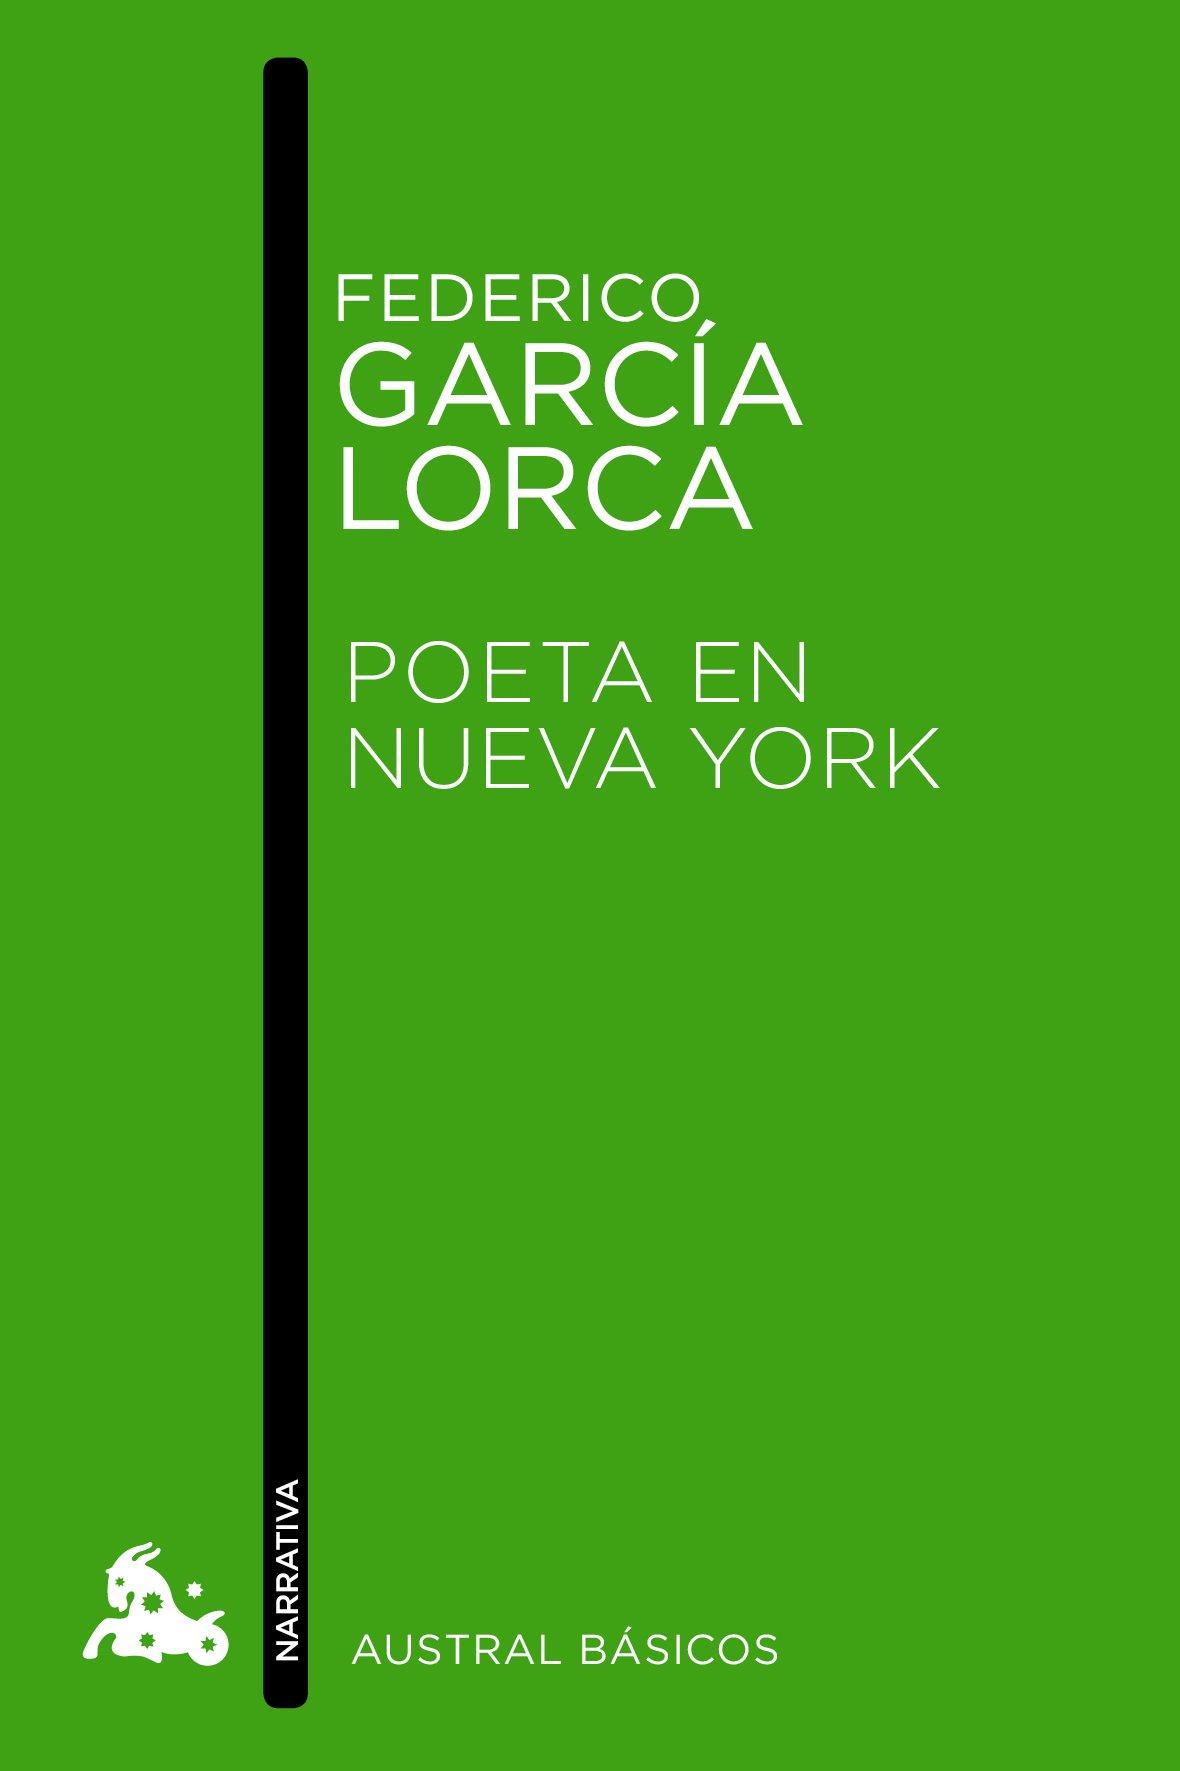 Reseña : Federico García Lorca, Poeta en Nueva York | palabradegatsby